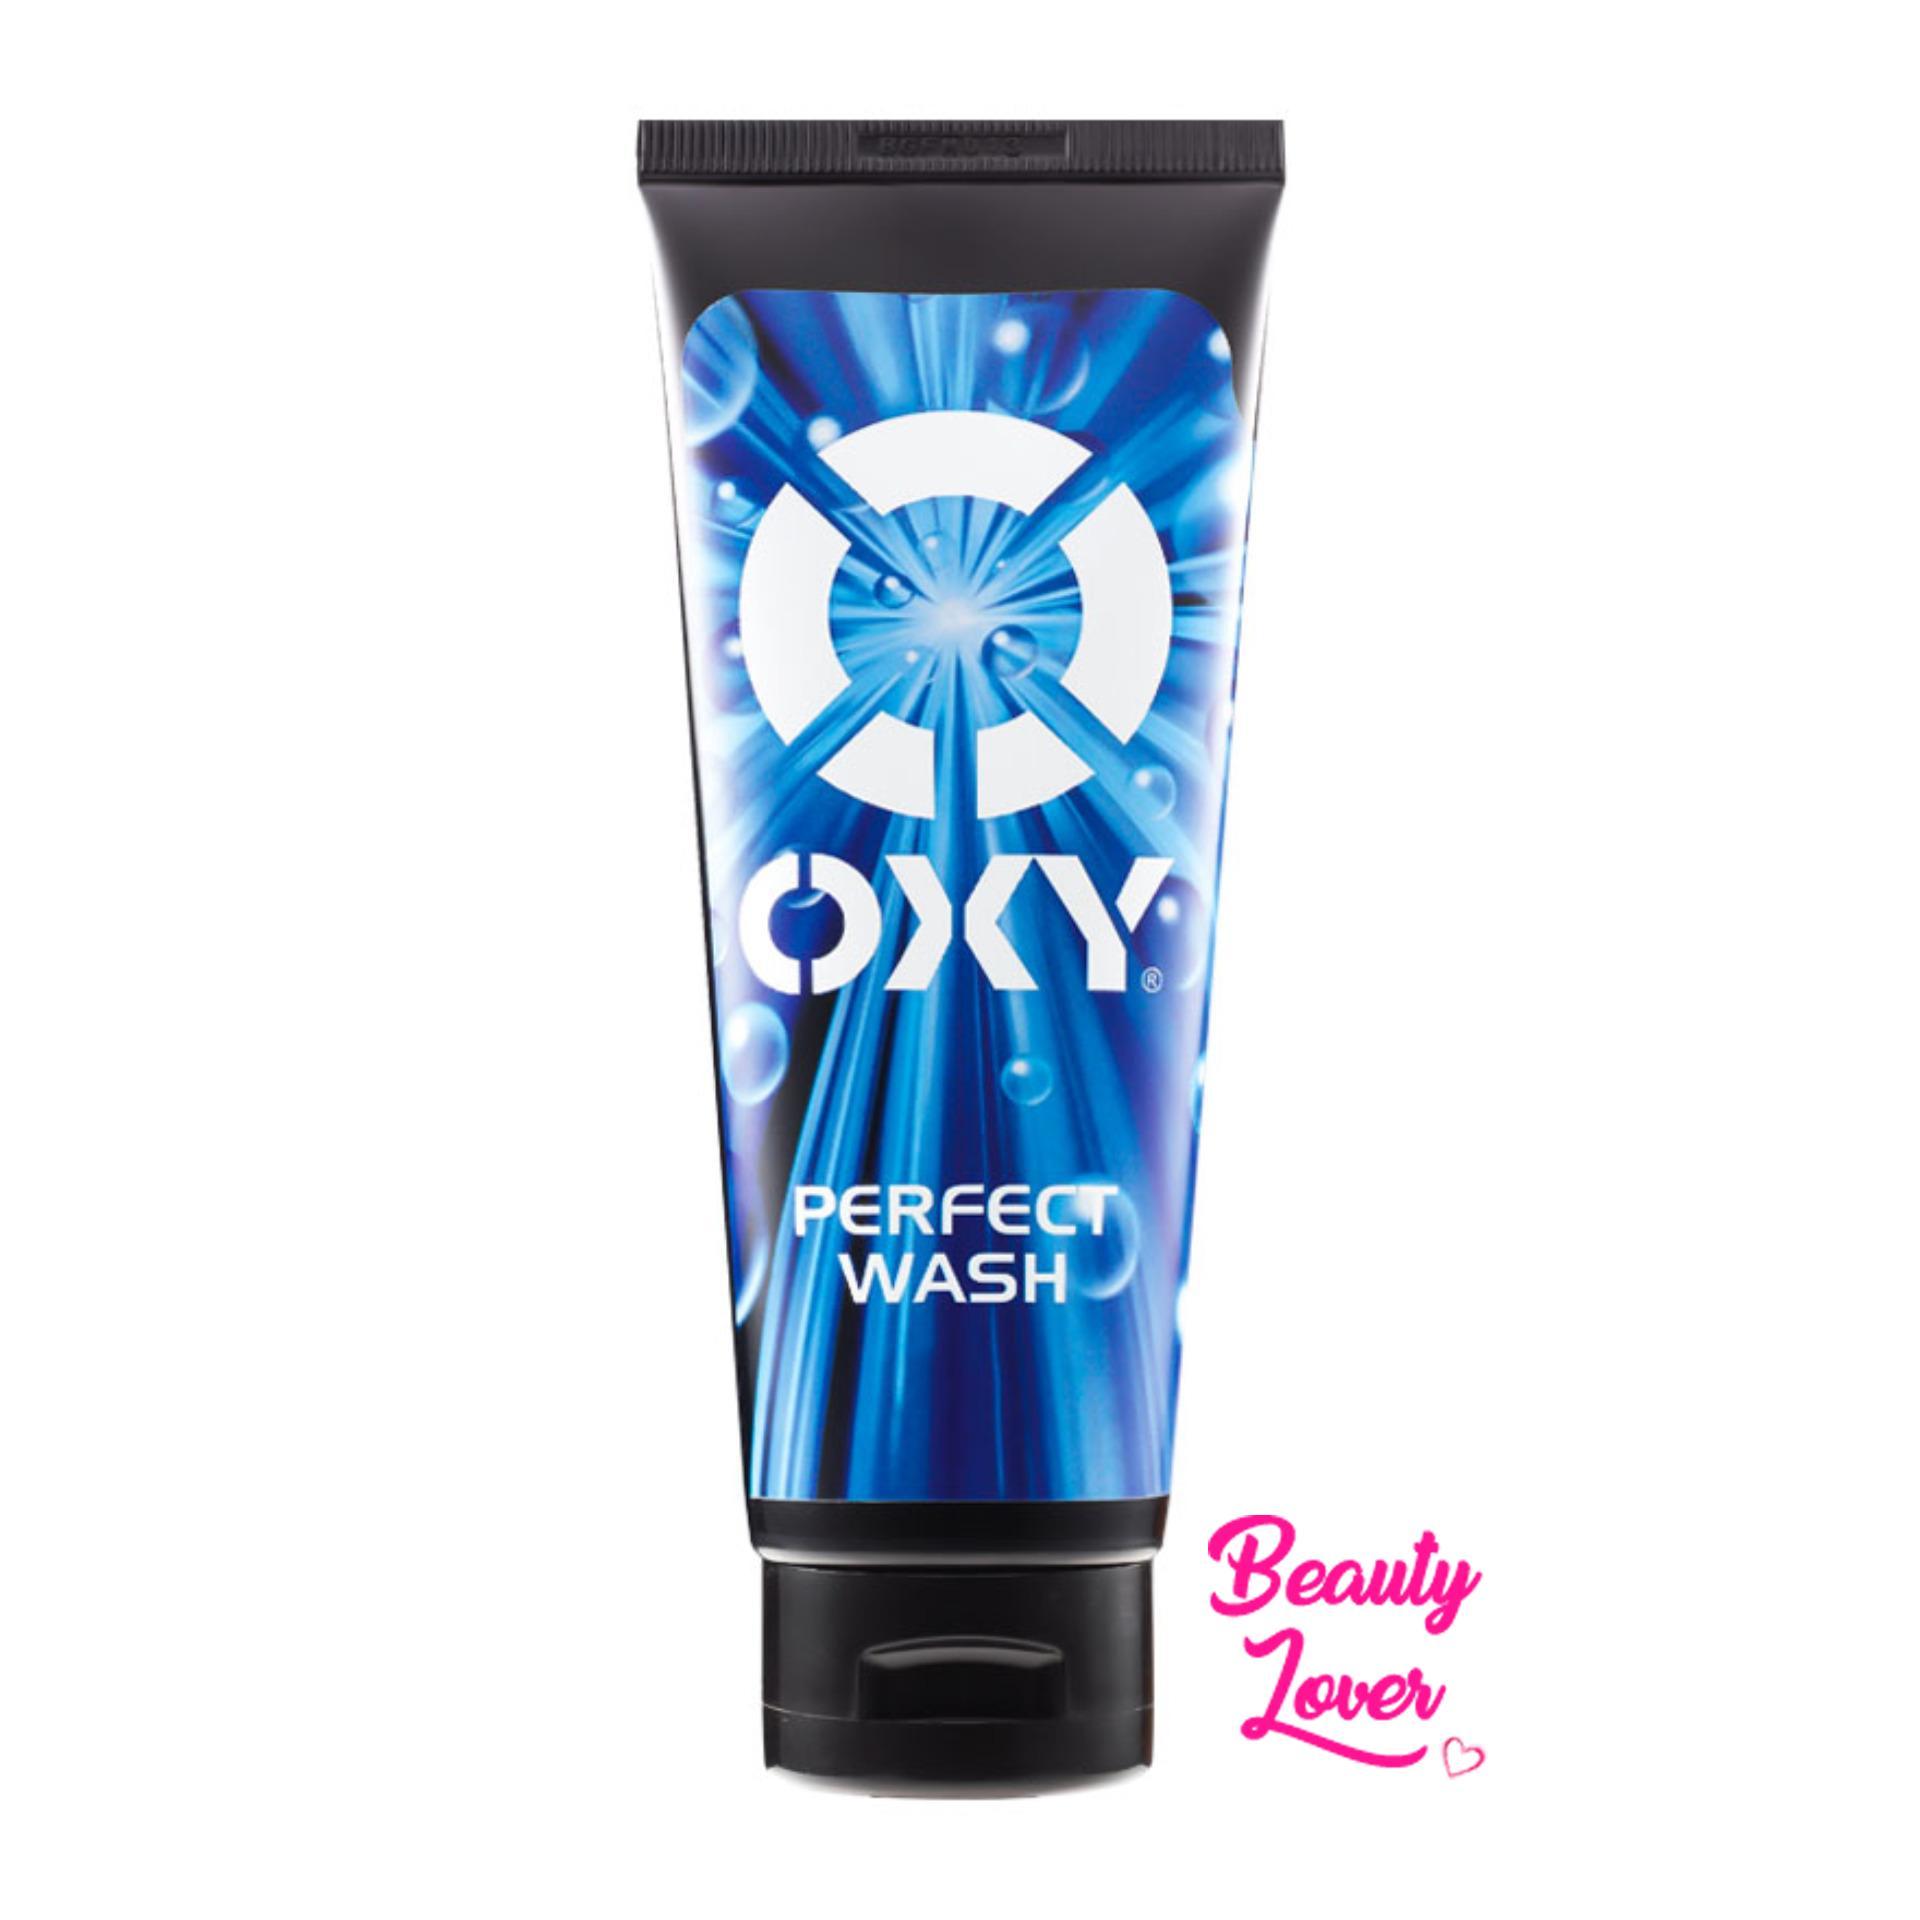 Jual Produk OXY Online Terbaru Di Lazada.co.id